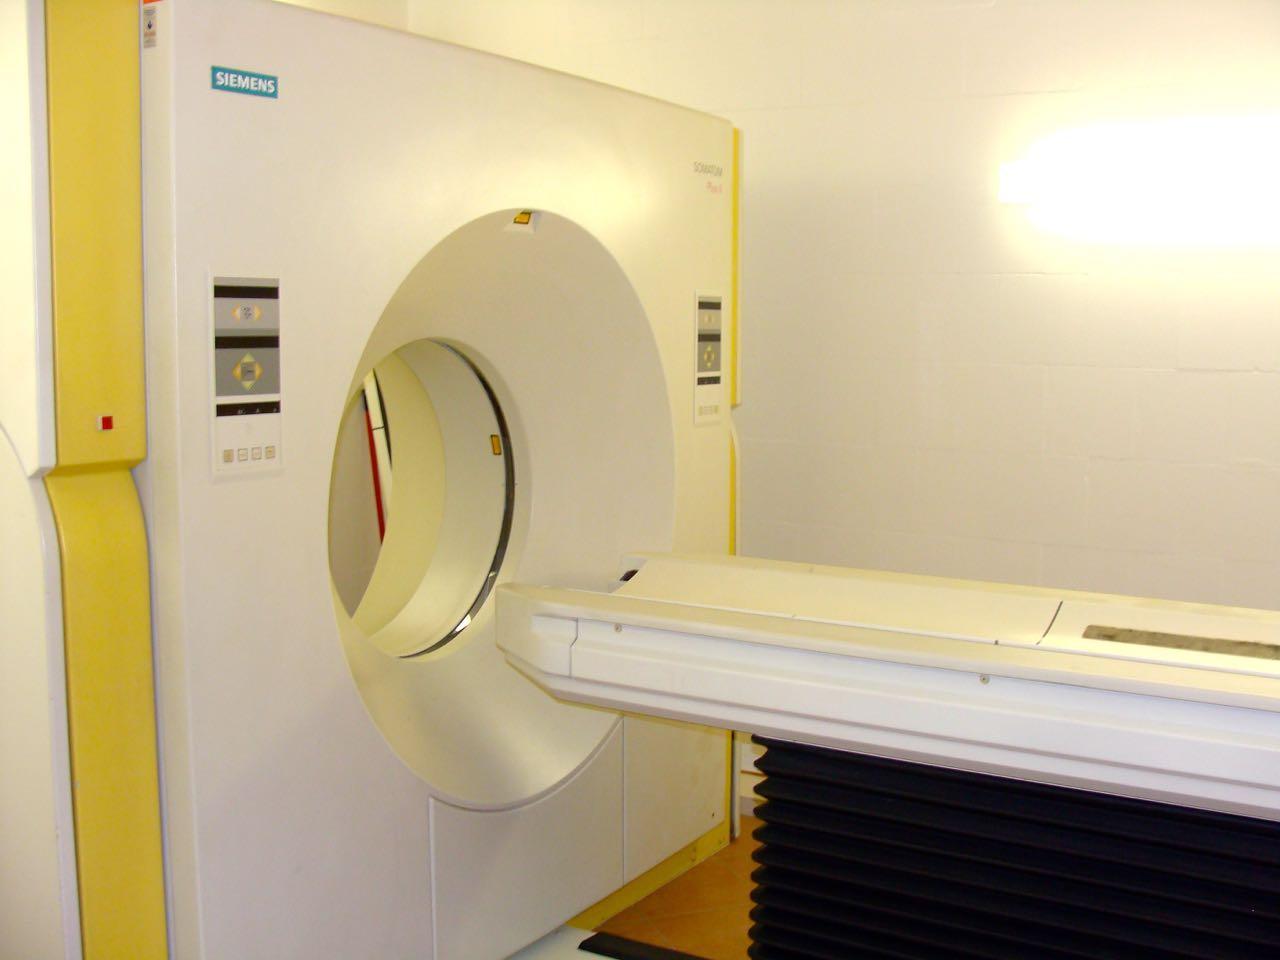 Computertomographie (CT)